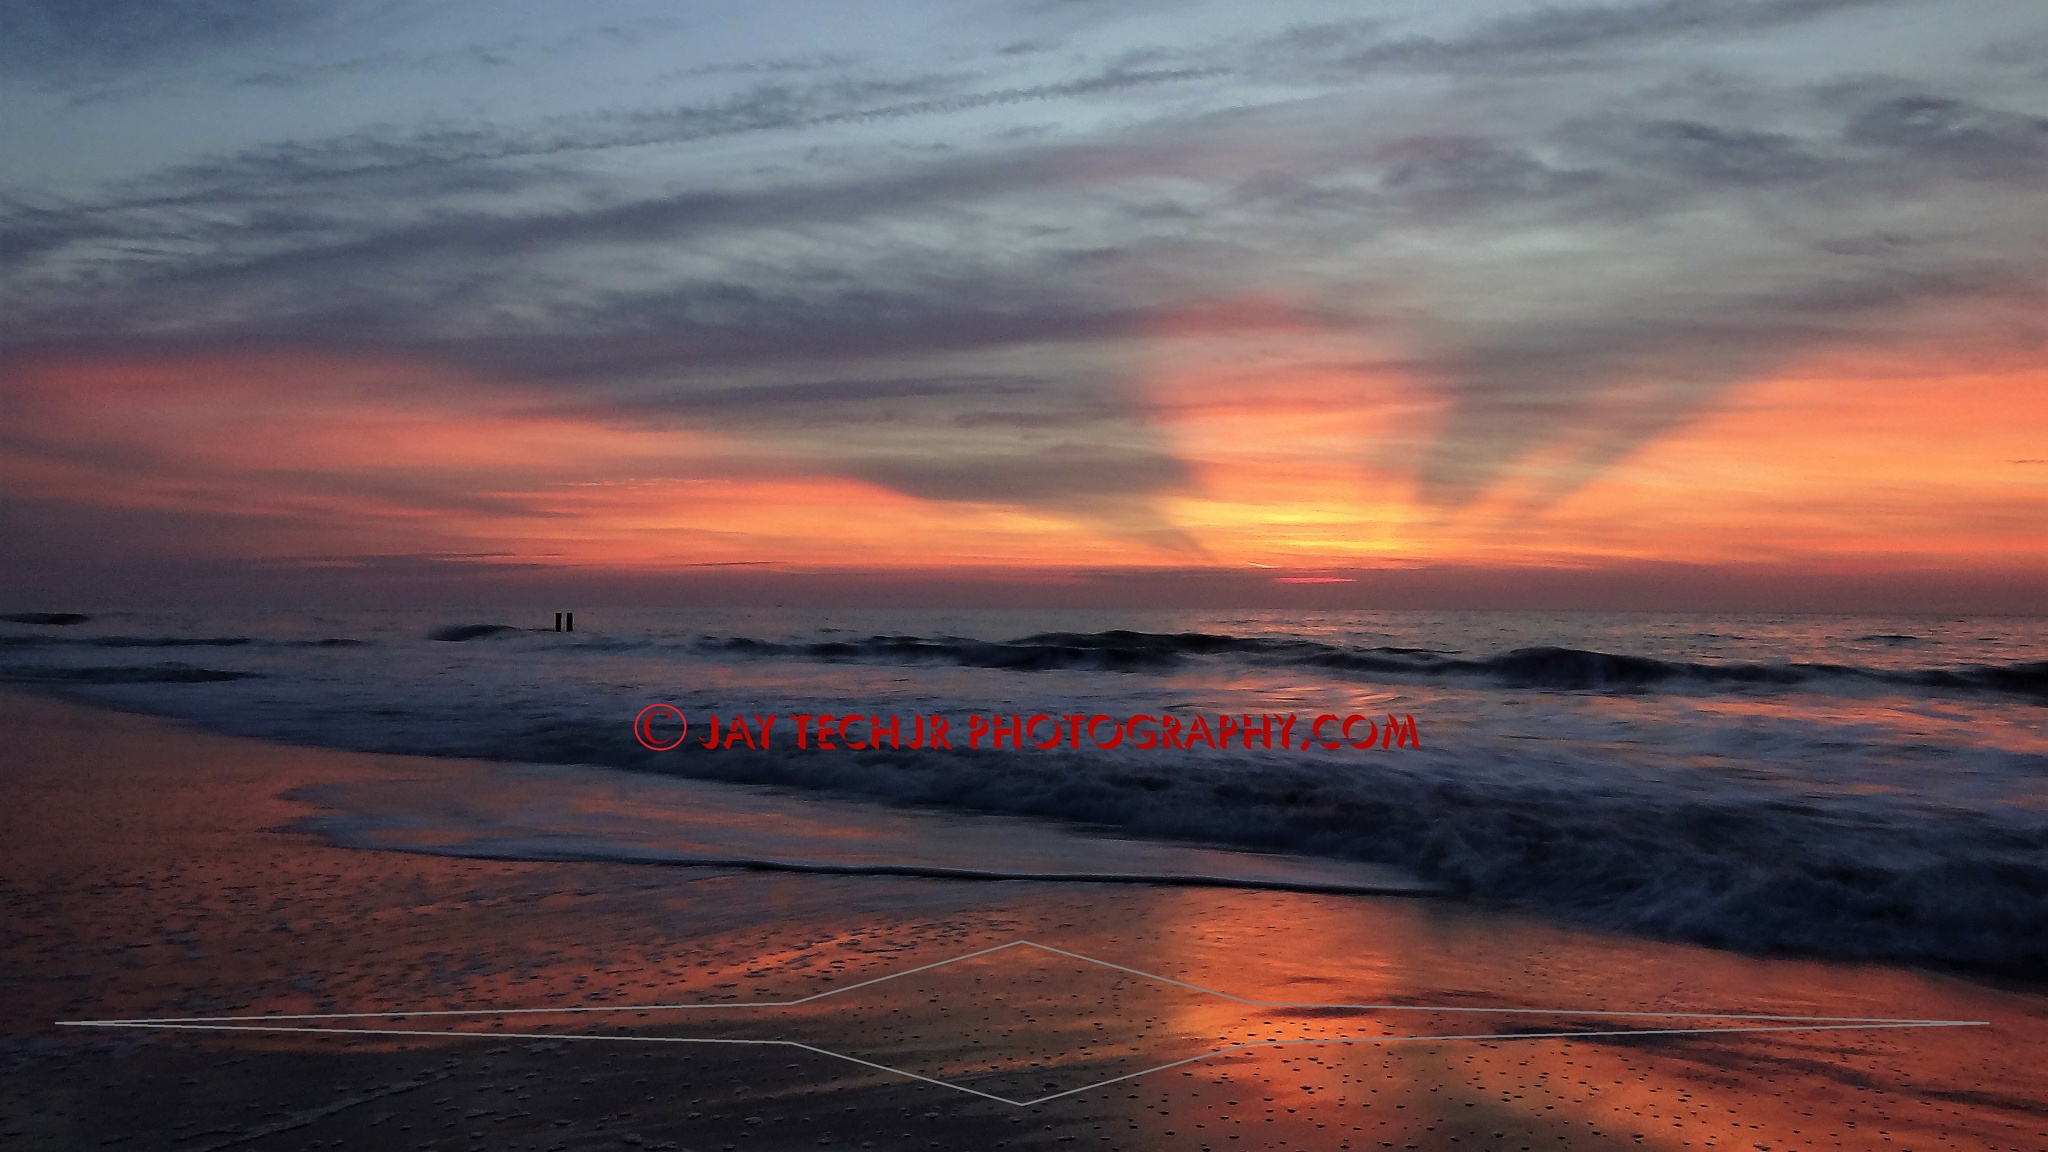 Wow Sunrise by Barreto Jr. Jaime